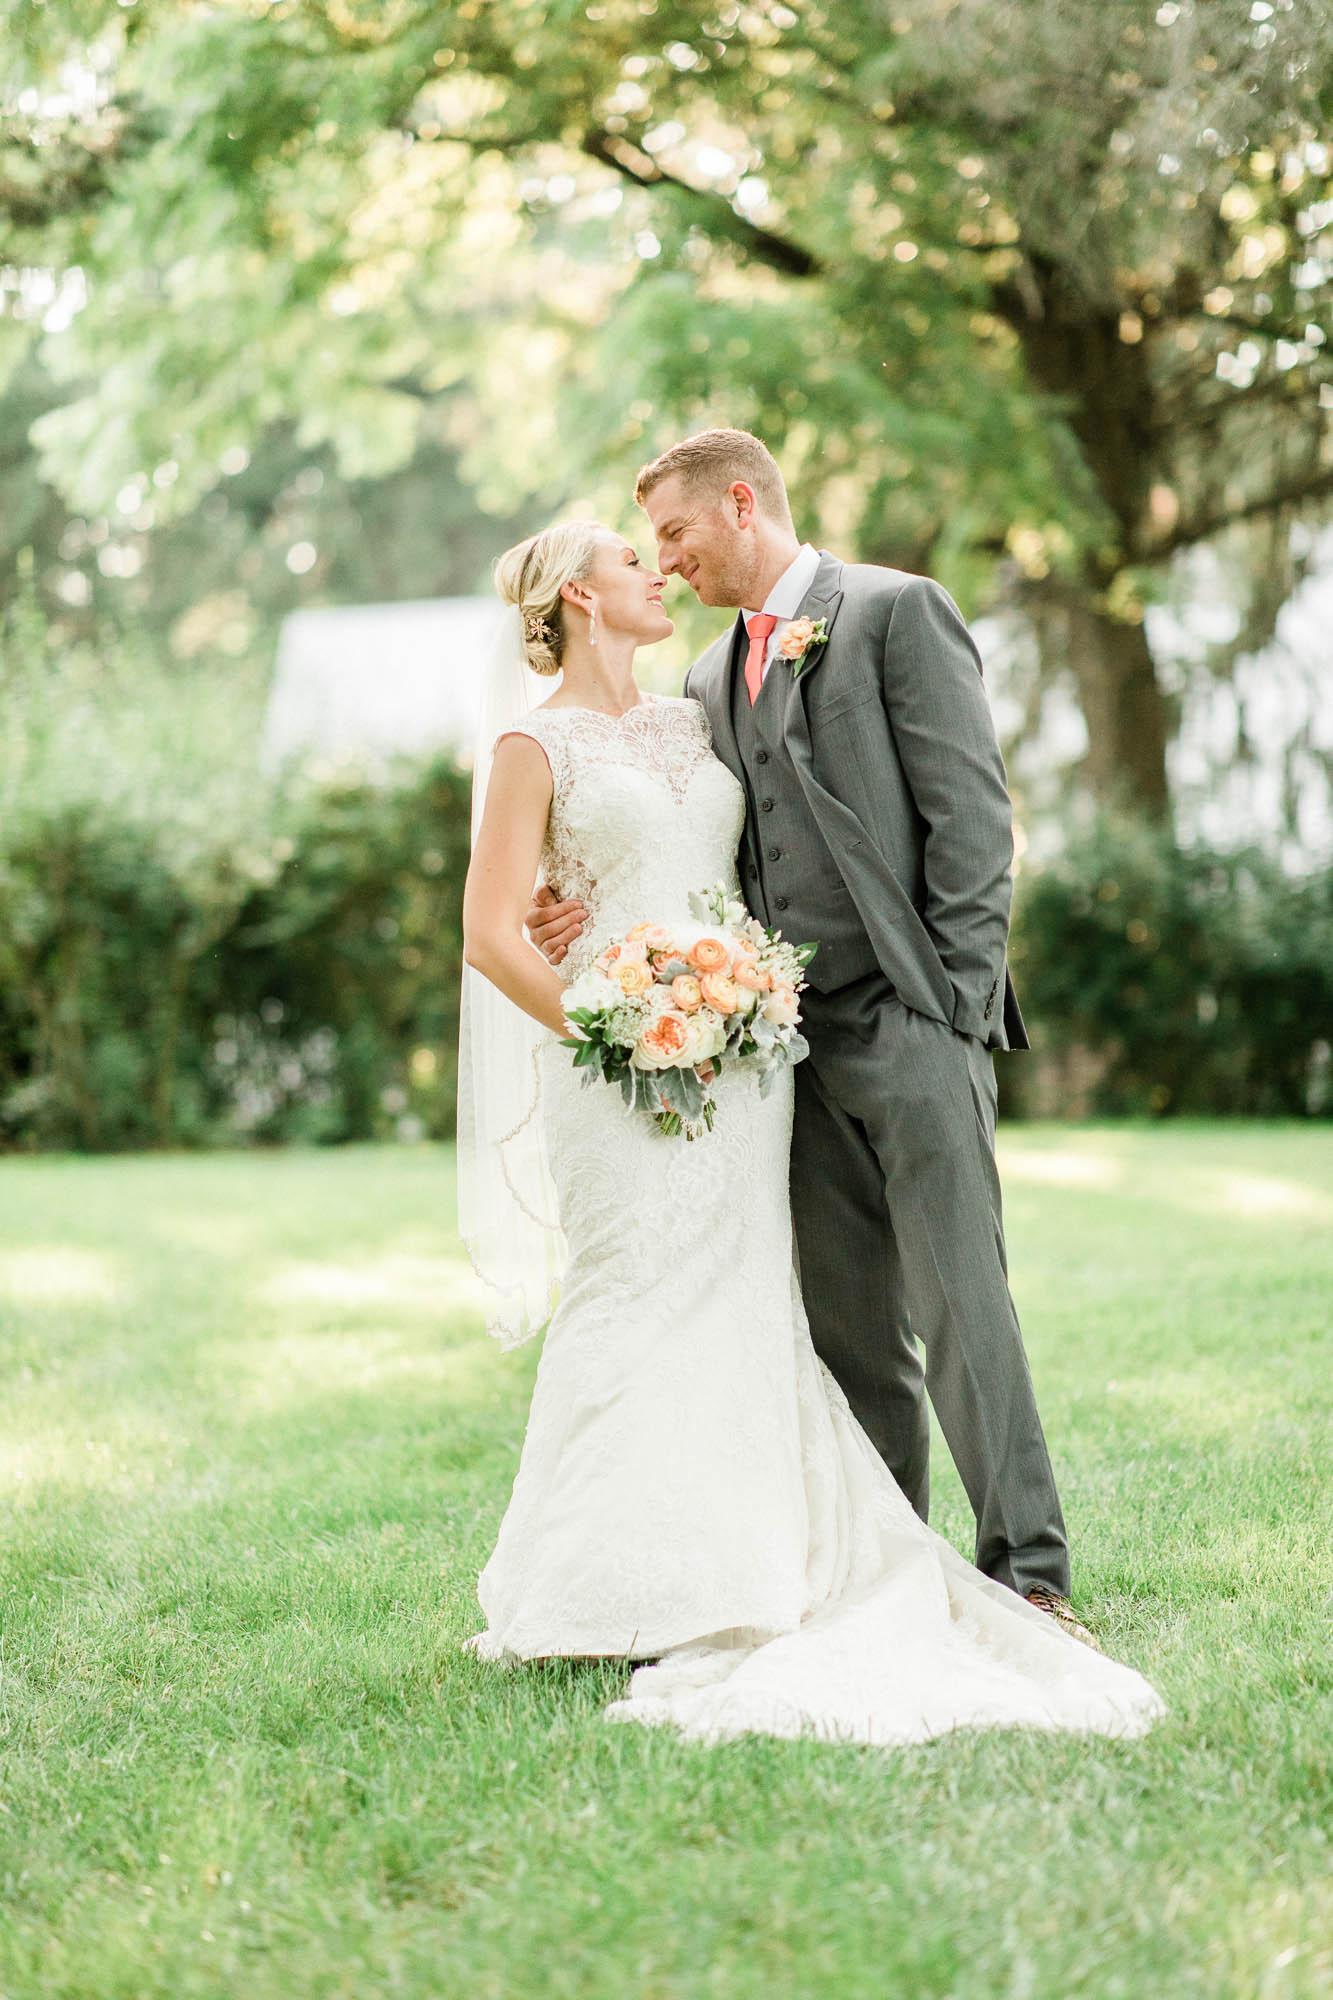 Allenberry-resort-historic-pennsylvania-wedding-22334.jpg